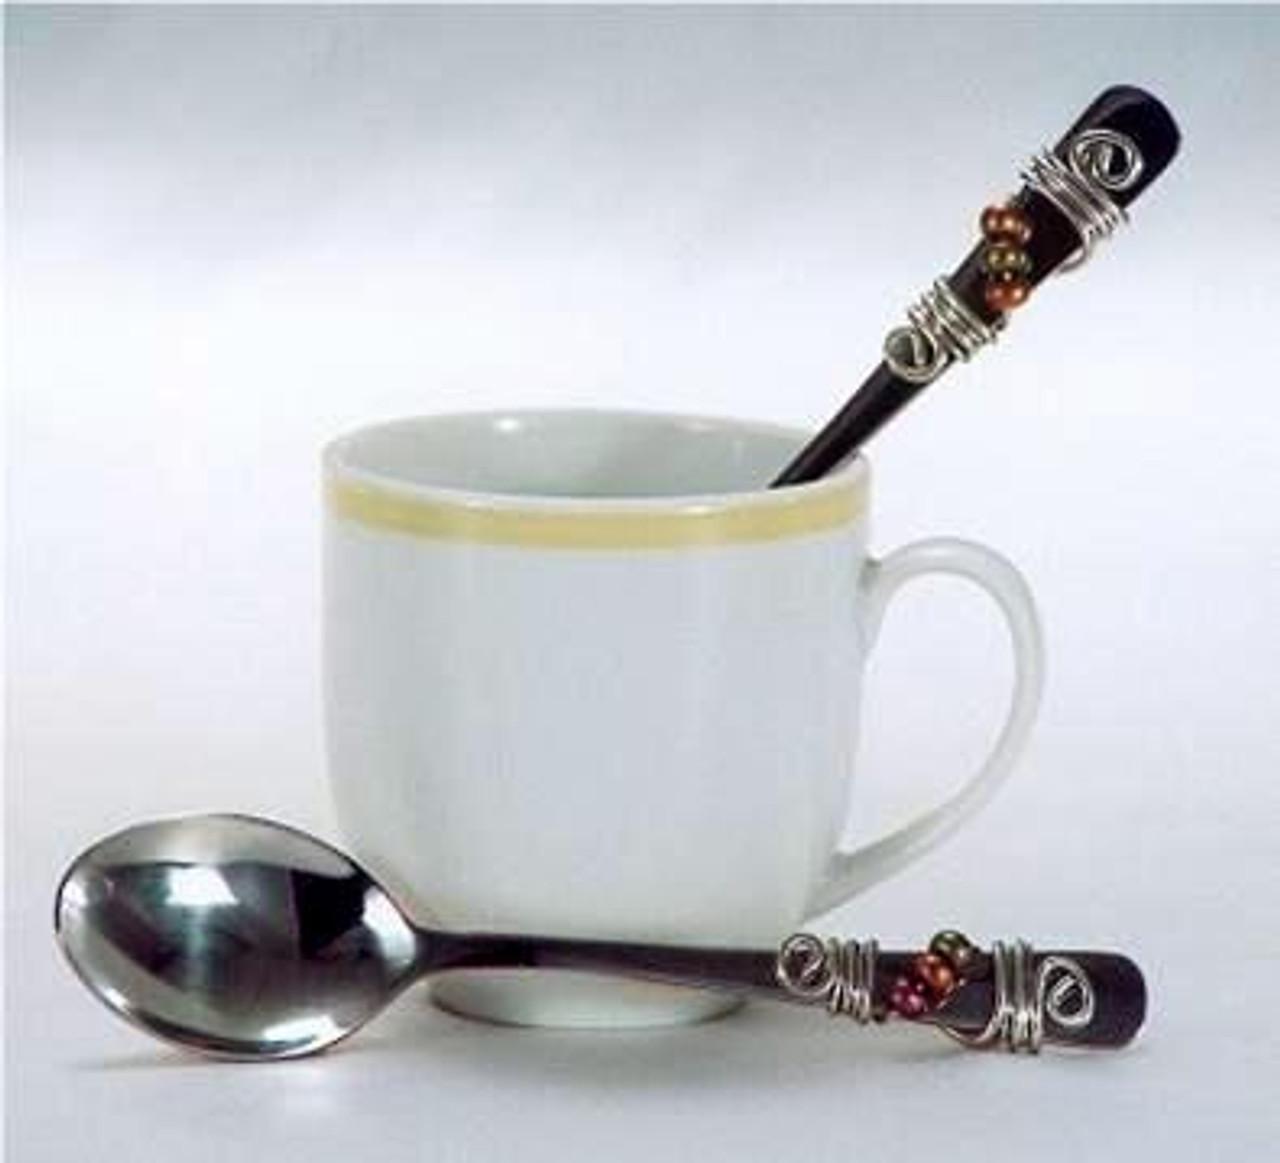 Dazzling Gourmet Beaded Espresso Spoon